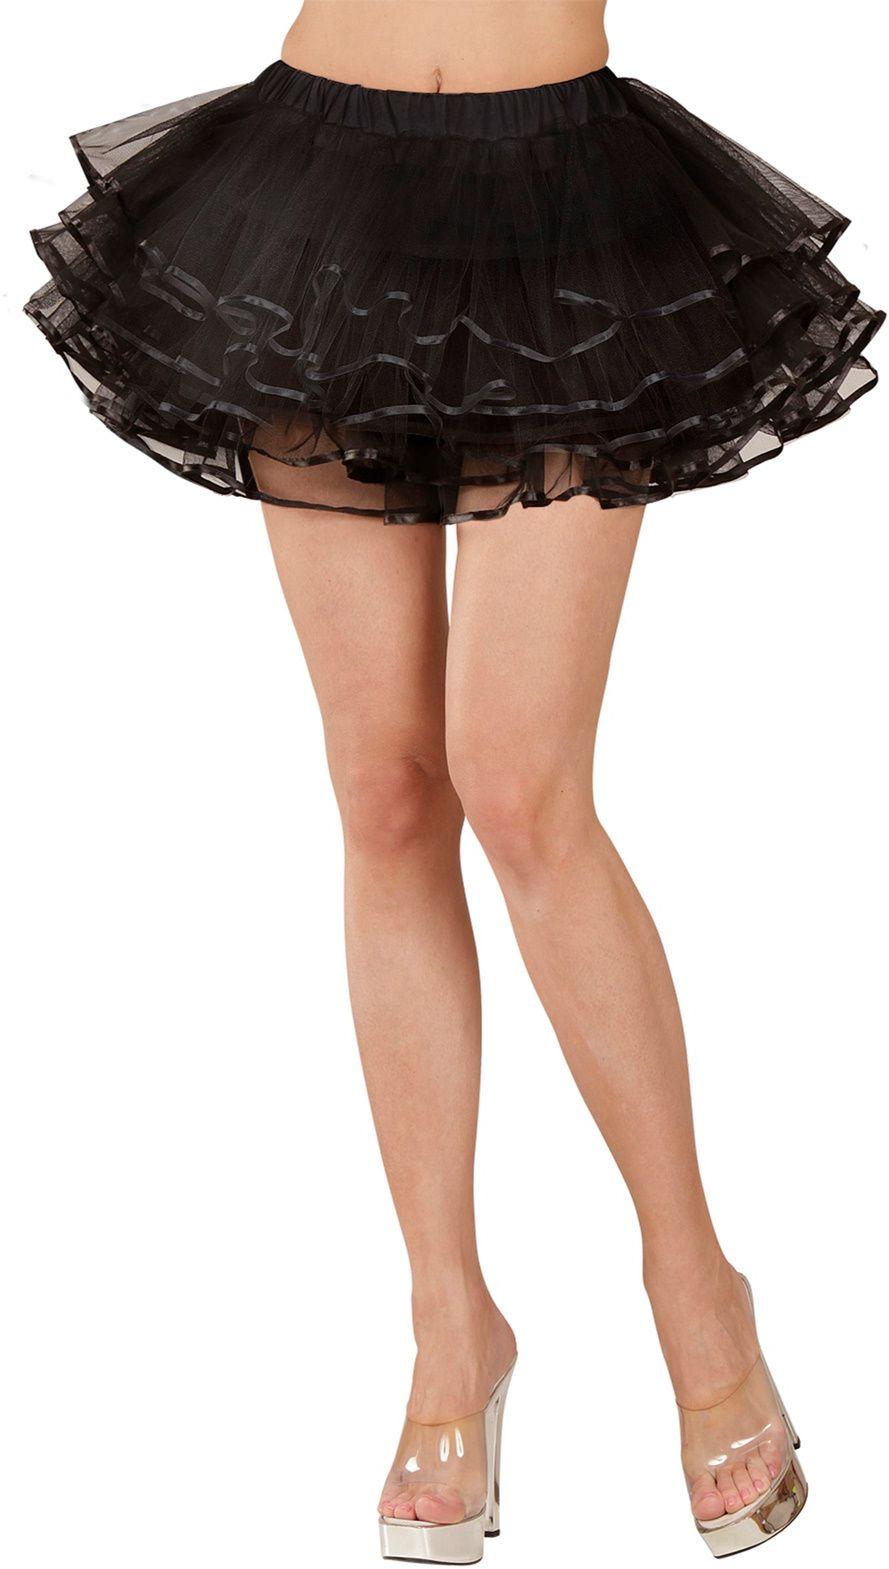 Zwarte luxe ballerina rokje